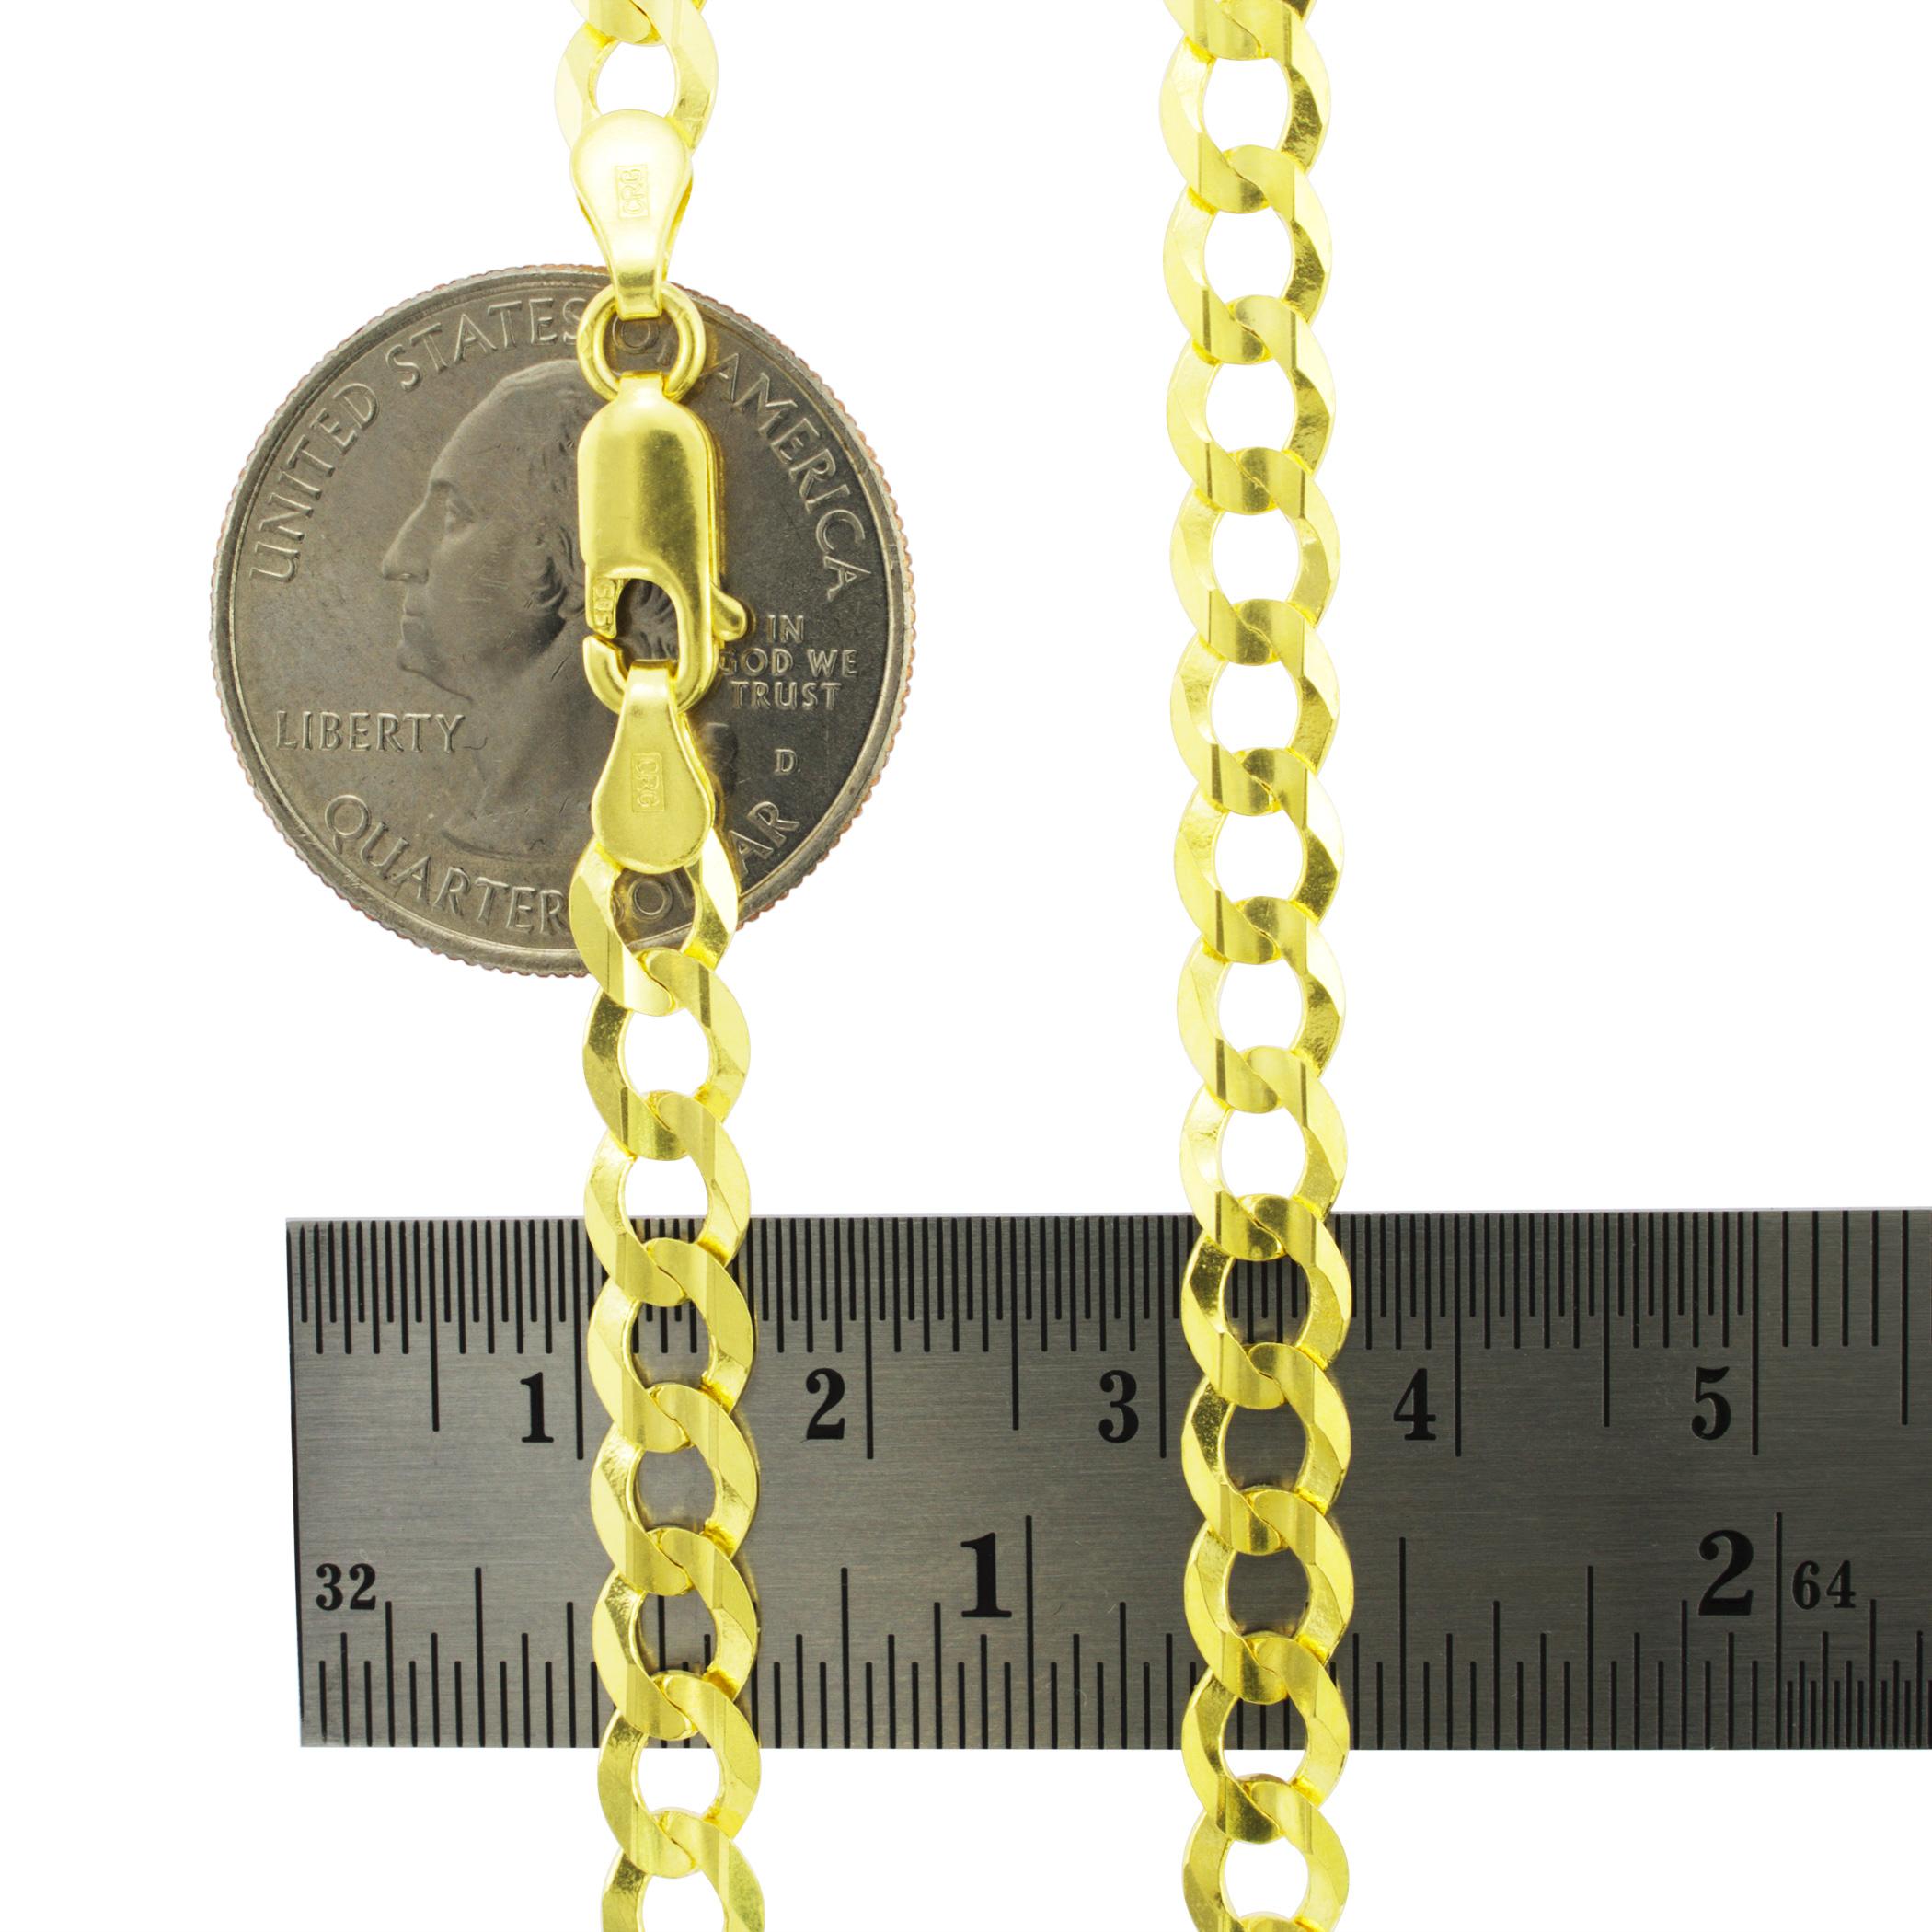 Solid-14K-Yellow-Gold-2-5mm-12mm-Cuban-Curb-Chain-Link-Bracelet-Men-Women-7-034-9-034 thumbnail 22